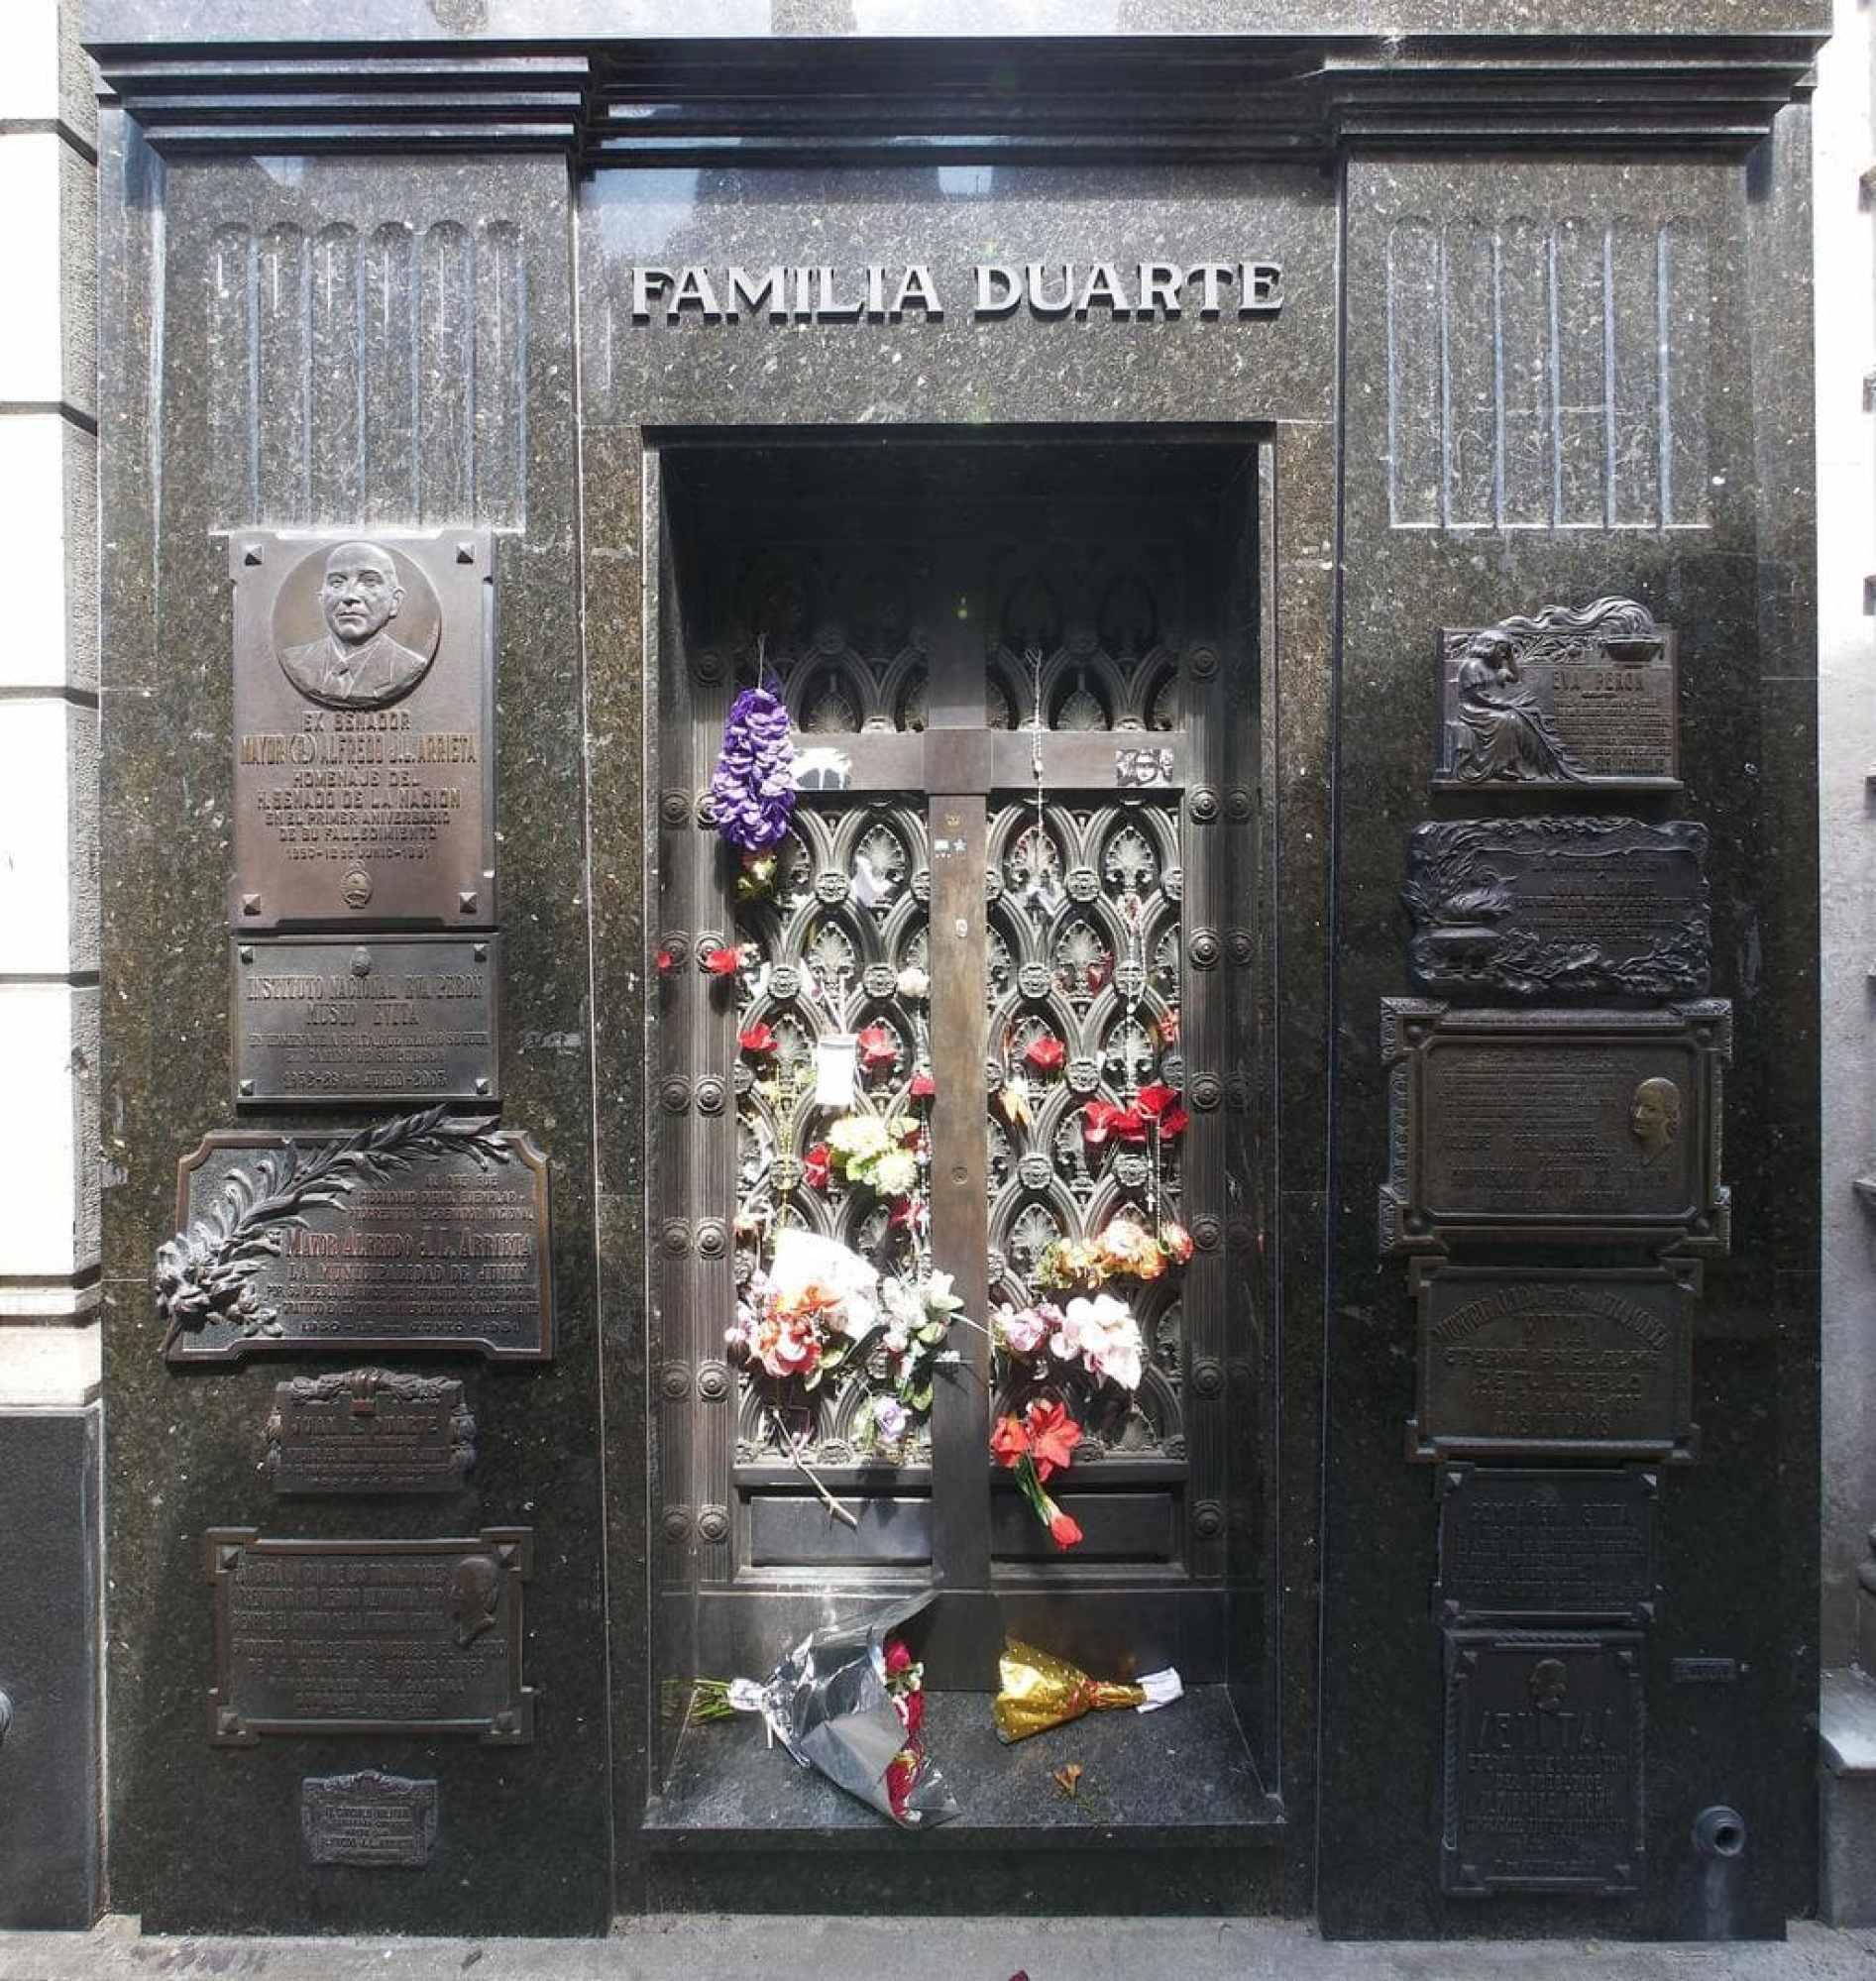 Recoleta Cemetery Familia Duarte